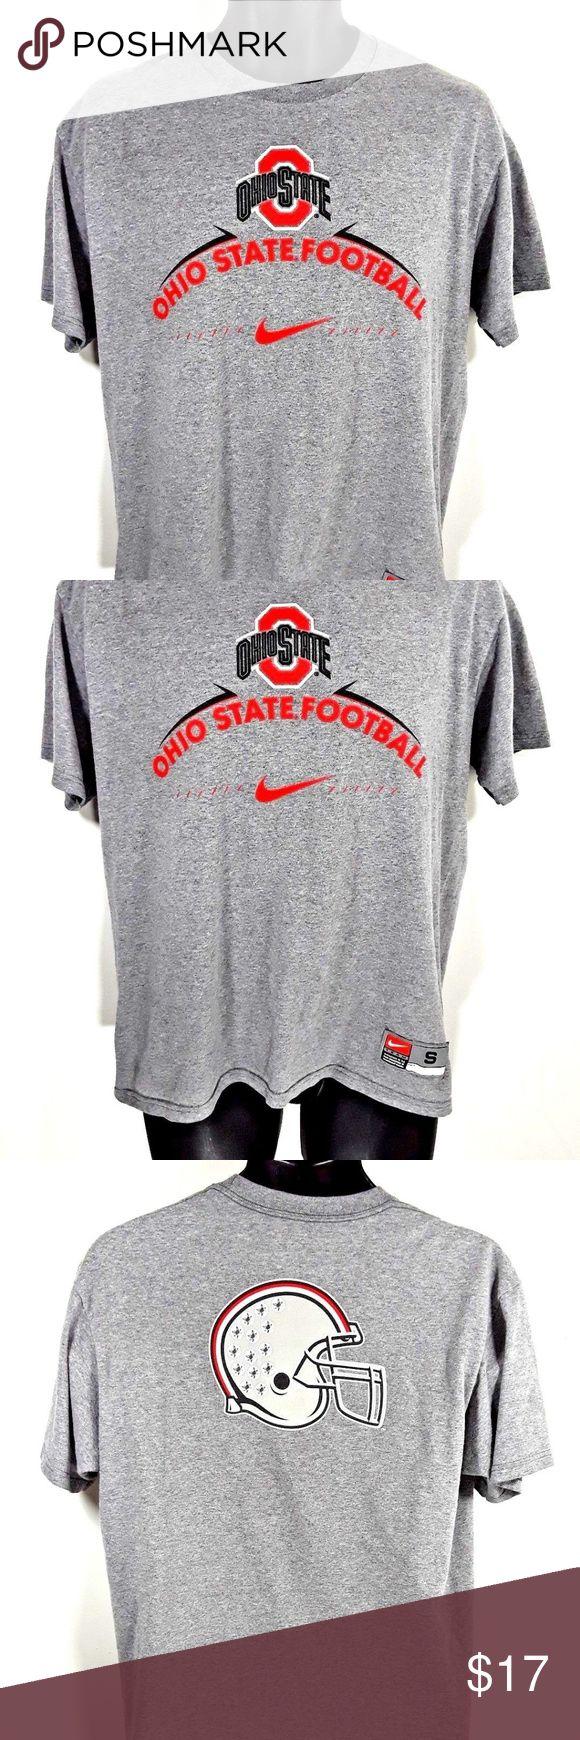 NIKE OHIO STATE BUCKEYES Football T-SHIRT SIZE S NIKE OHIO STATE BUCKEYES Football T-SHIRT, Men's S Small Gray helmet on back Nike Shirts Tees - Short Sleeve